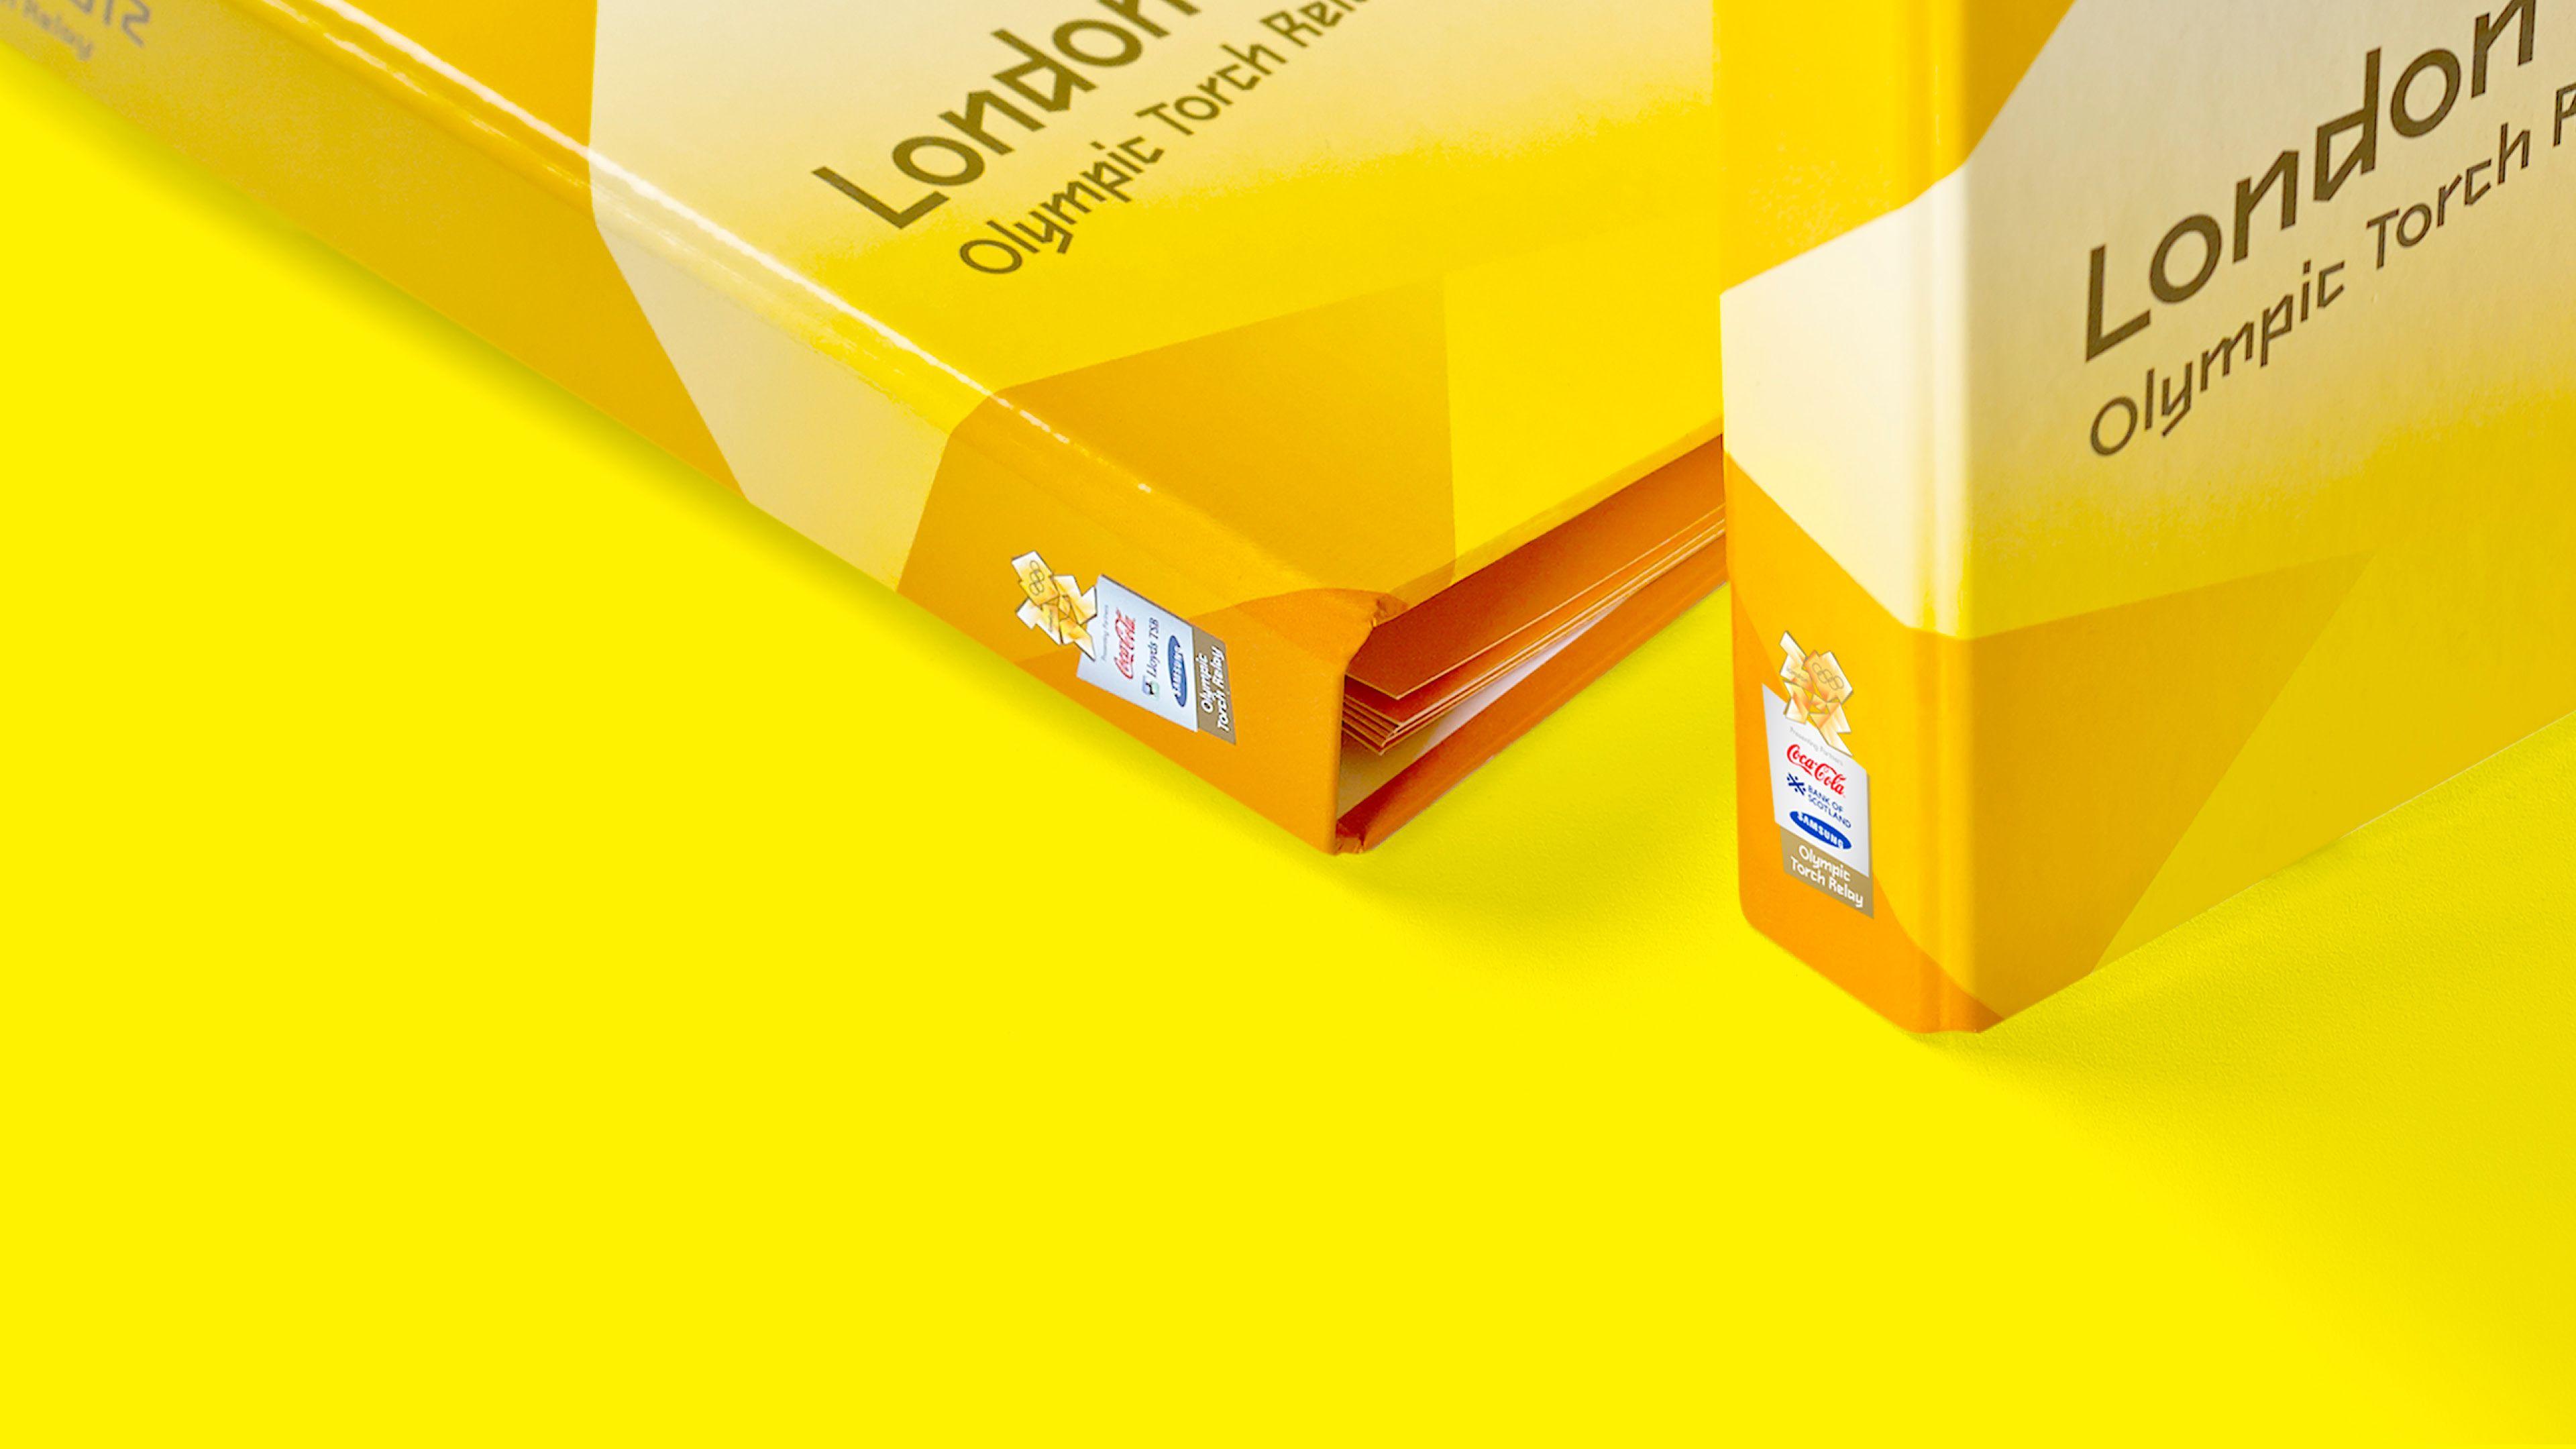 LOCOG 2010/11 Publications